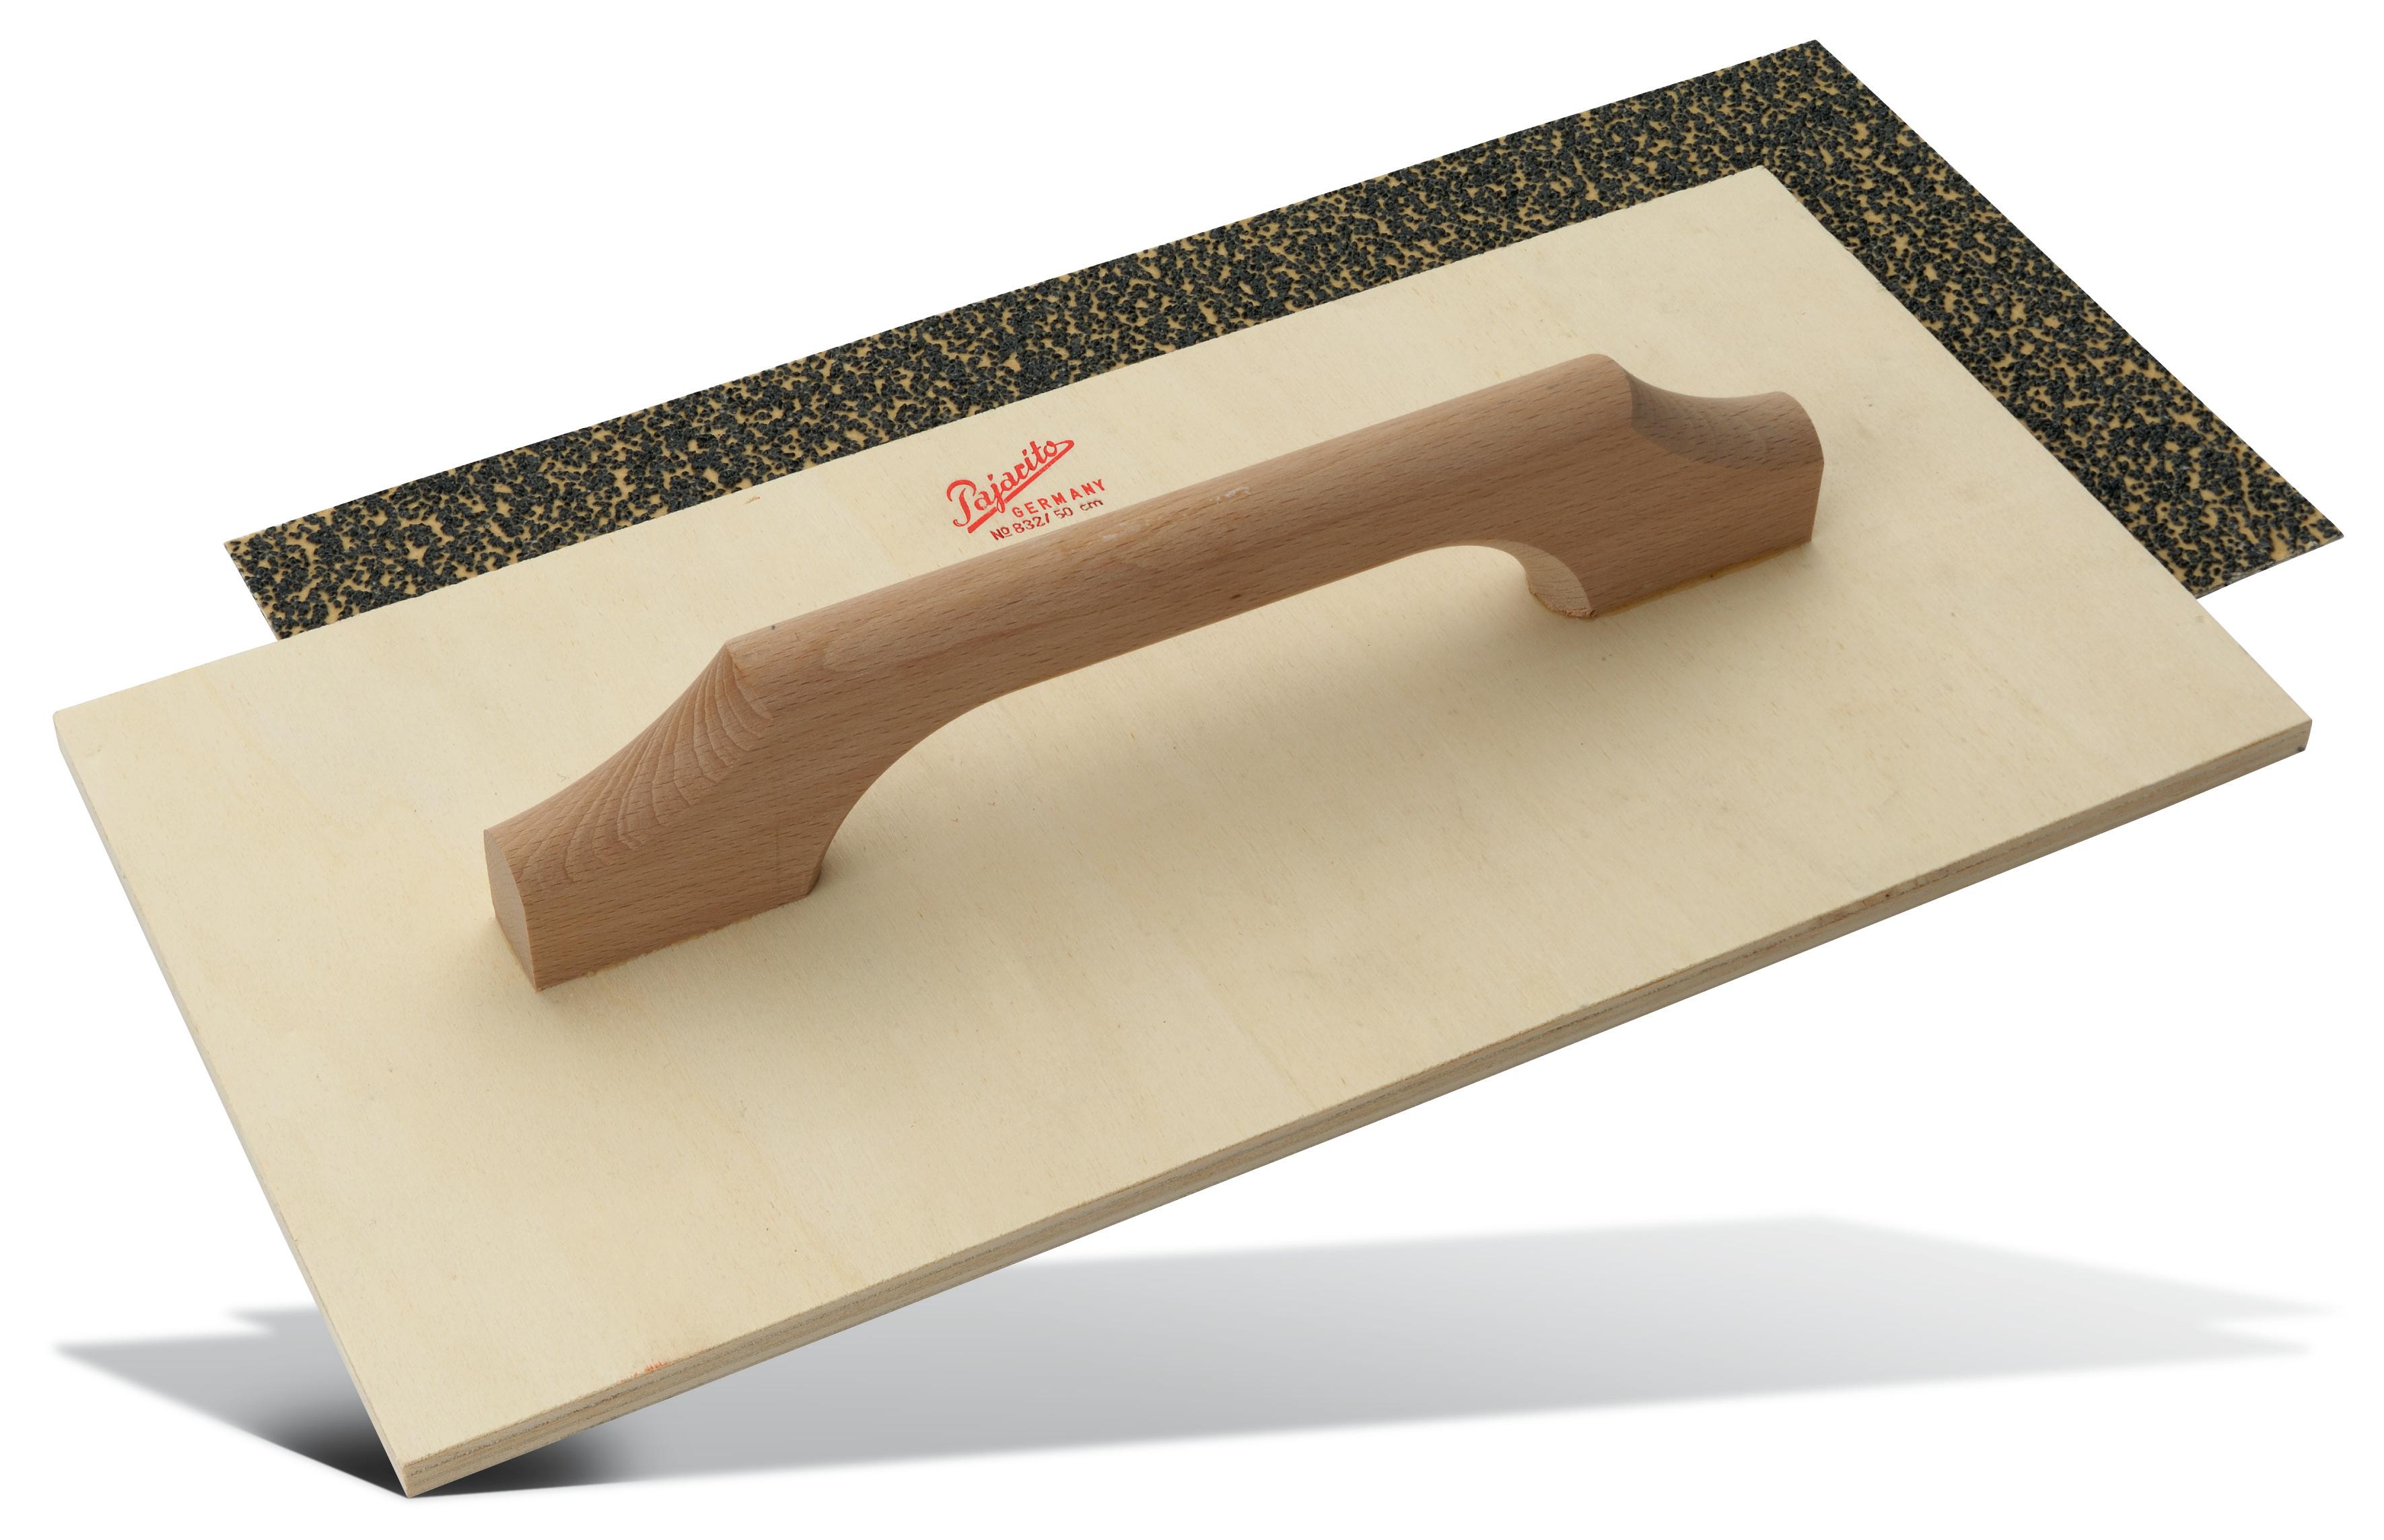 Corundum-coated paper, self-adhesive grain size 16 Pajarito